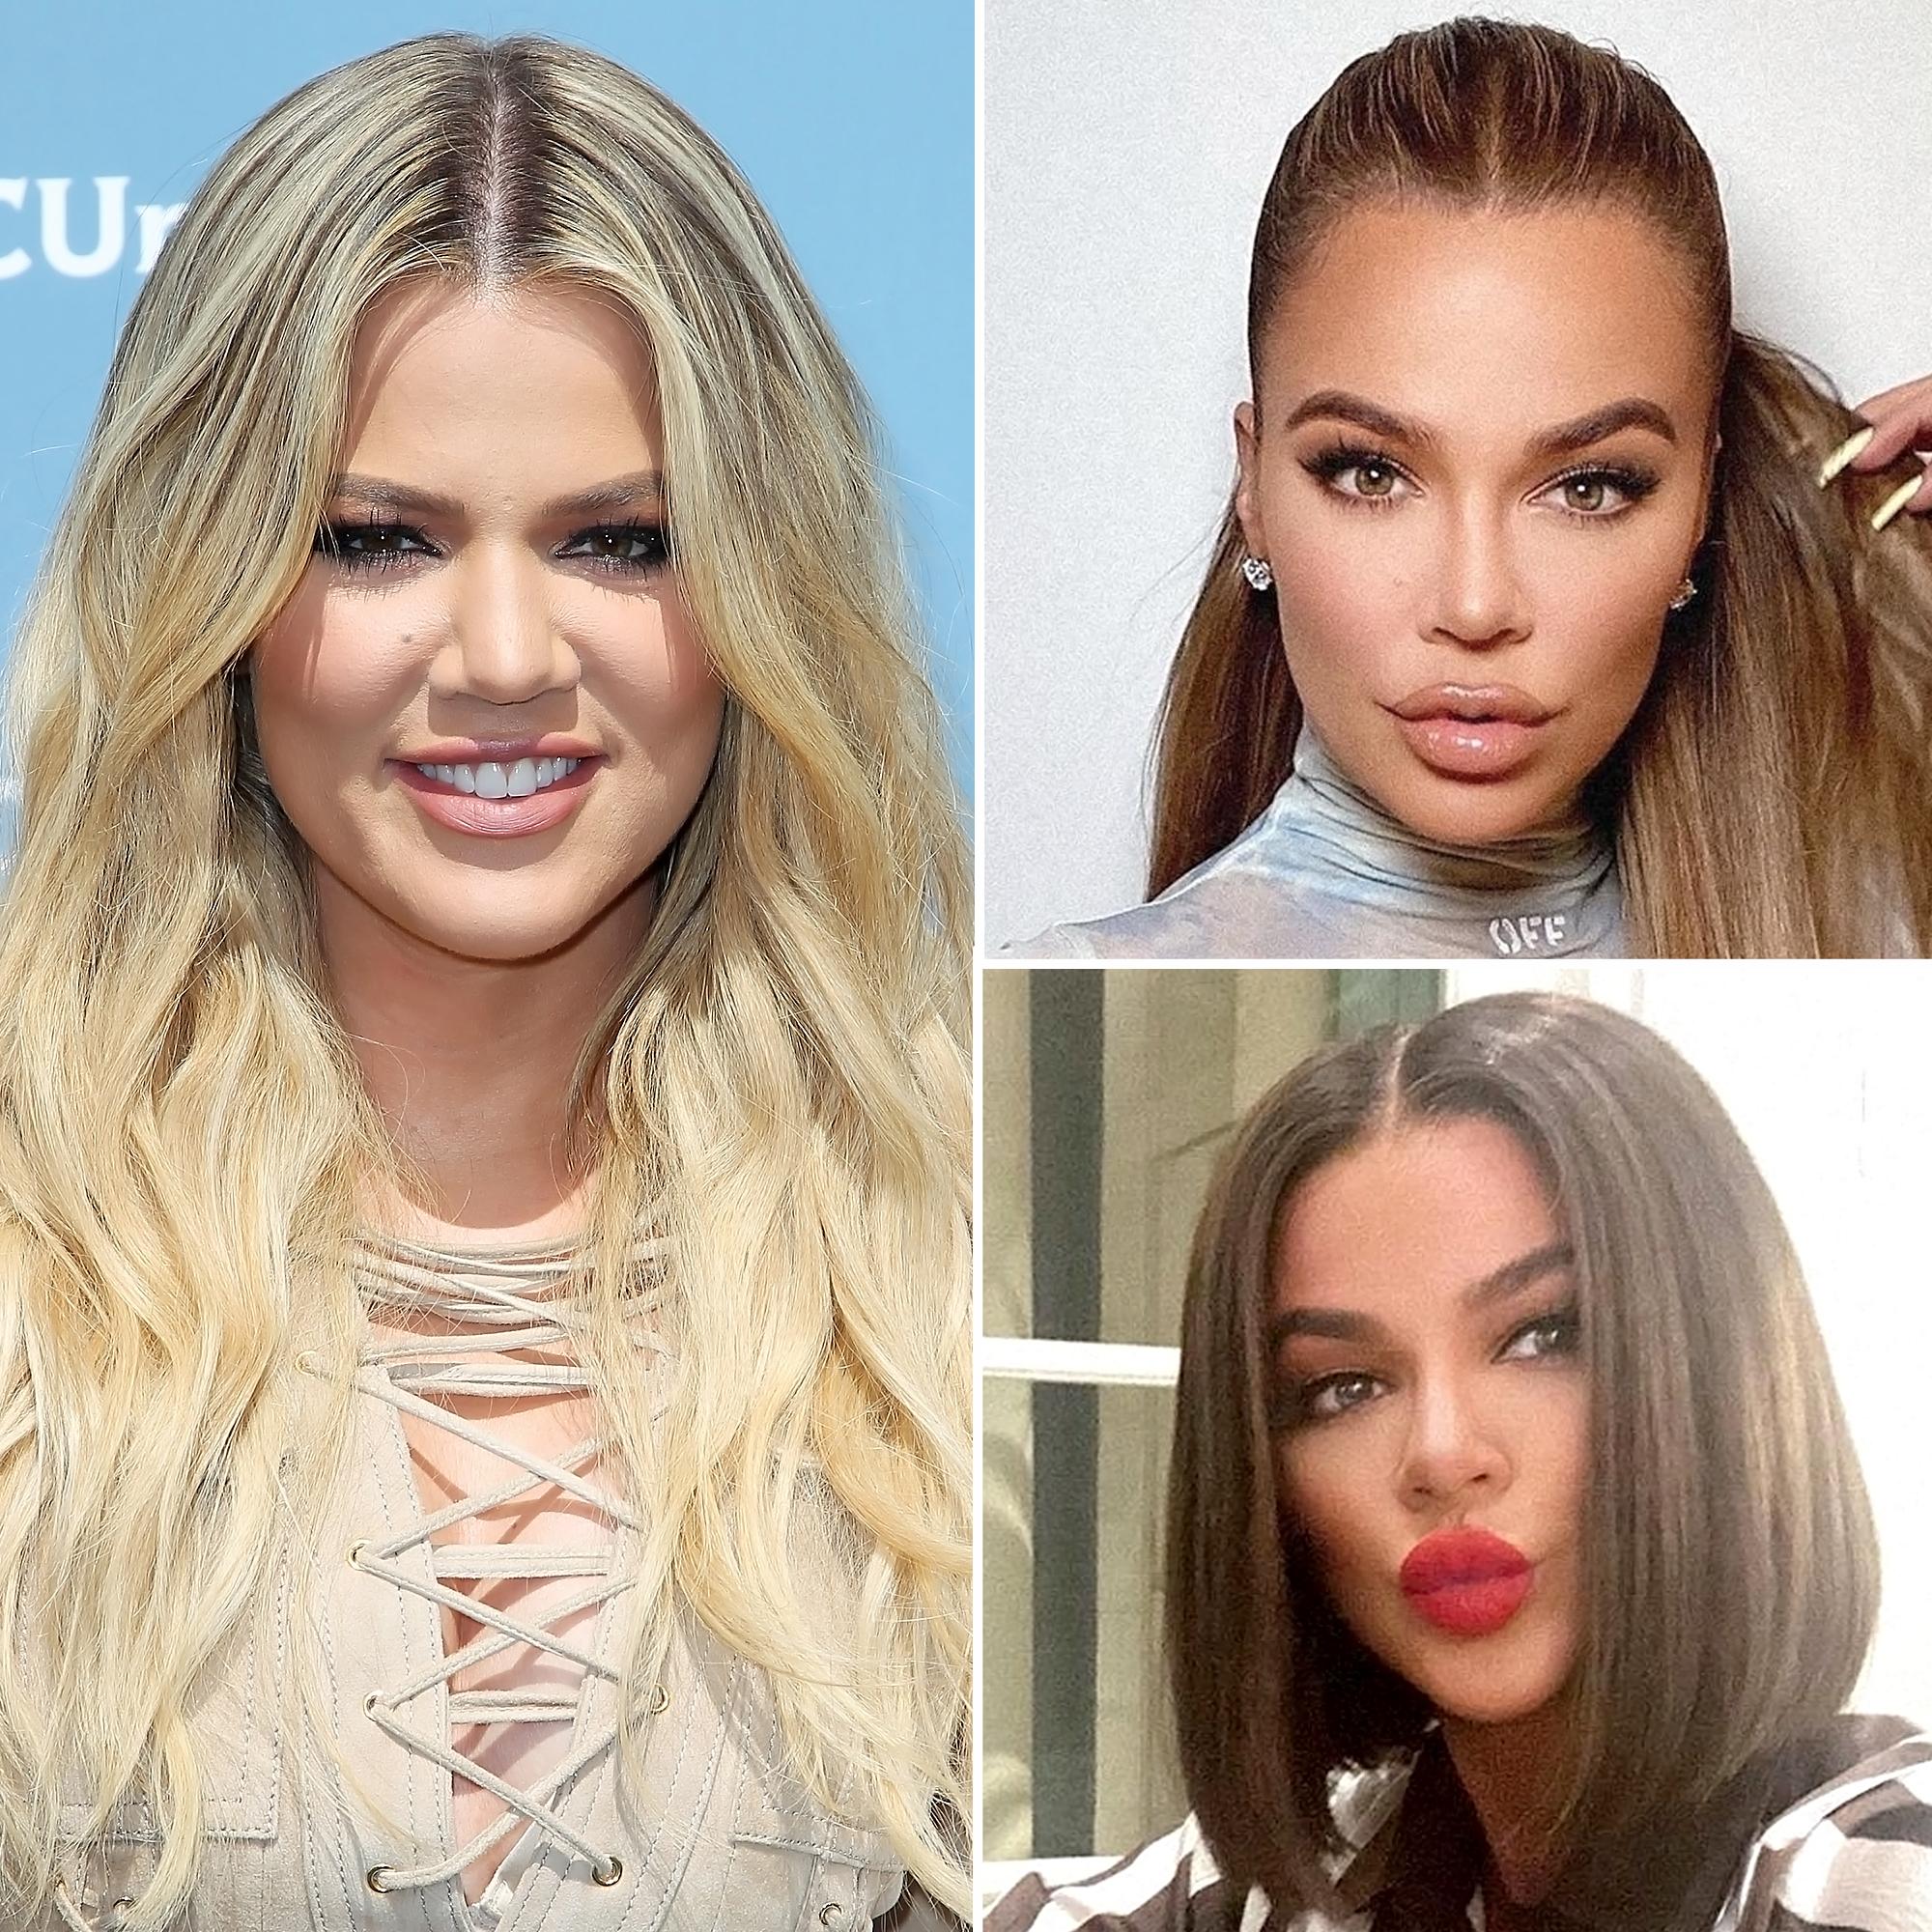 Khloe Kardashian On Her Ever Changing Look Facetune Allegations